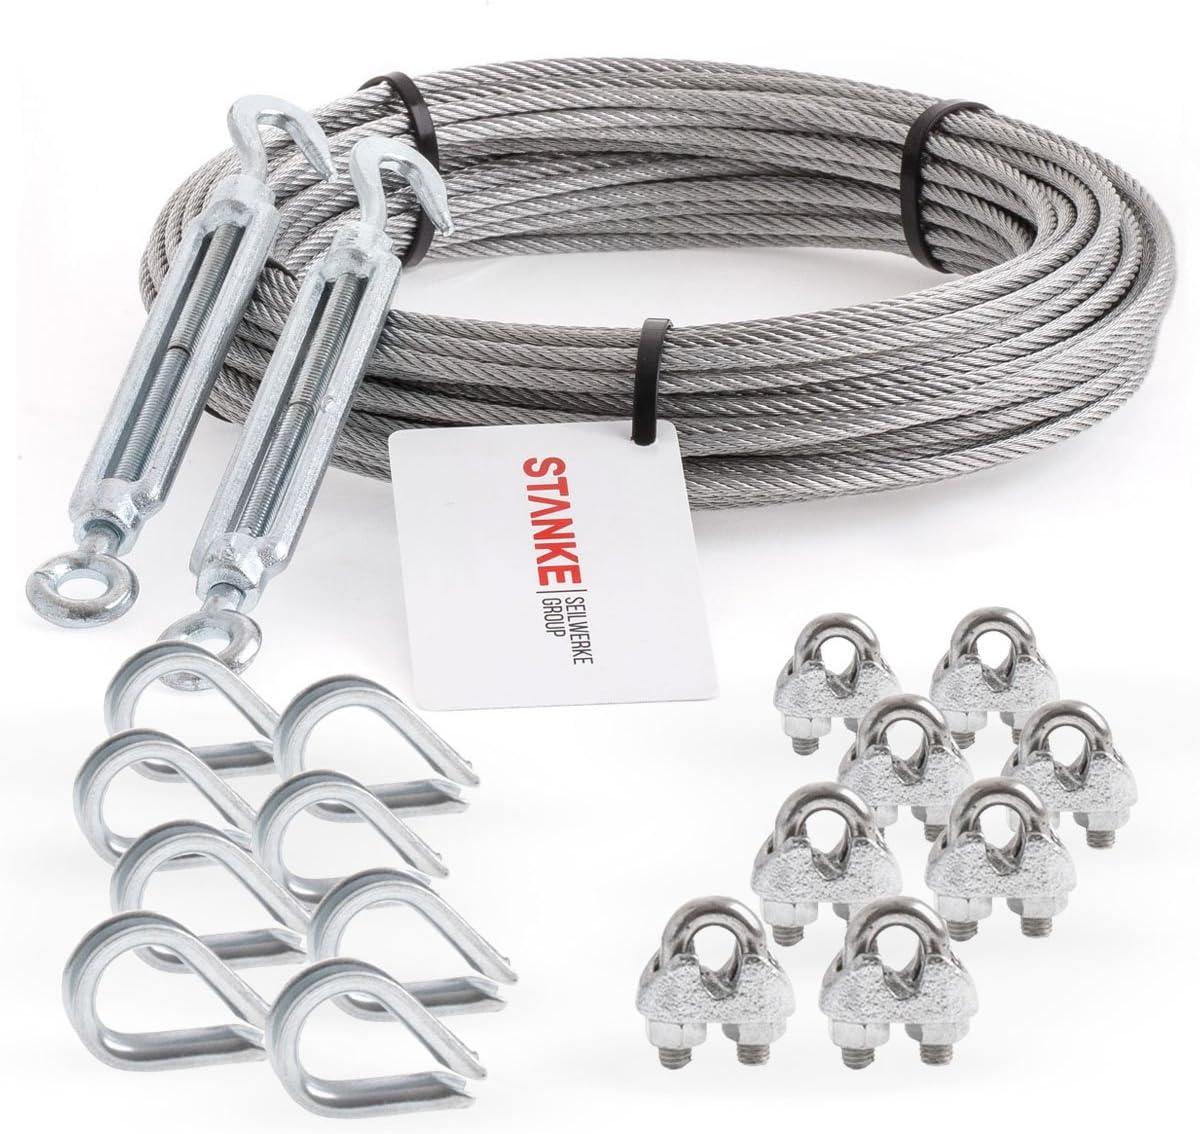 L/änge 200 cm SPR-07-200 Seilwerk STANKE Stahl Profilrohr Stahlrohr Vierkantprofil 60x30x2 mm Rohstahl